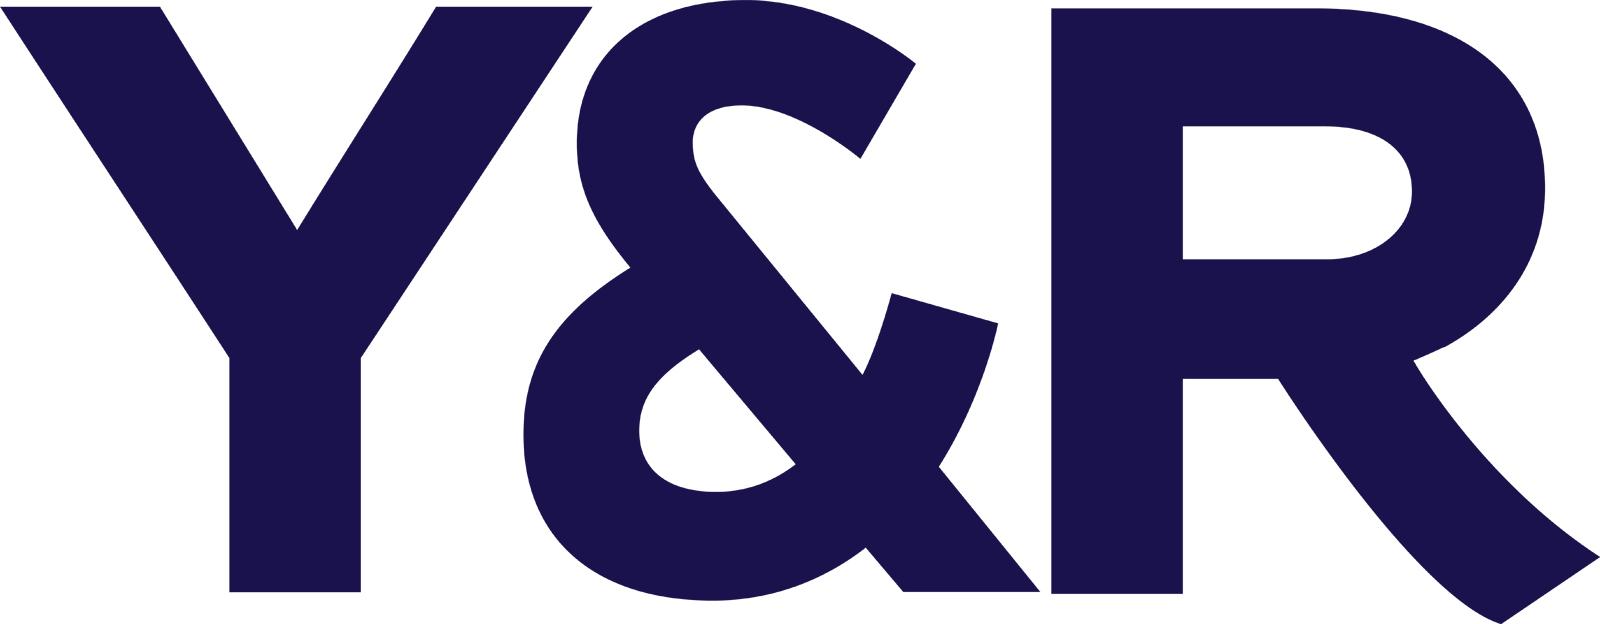 Y&R_LogoAzul.jpg